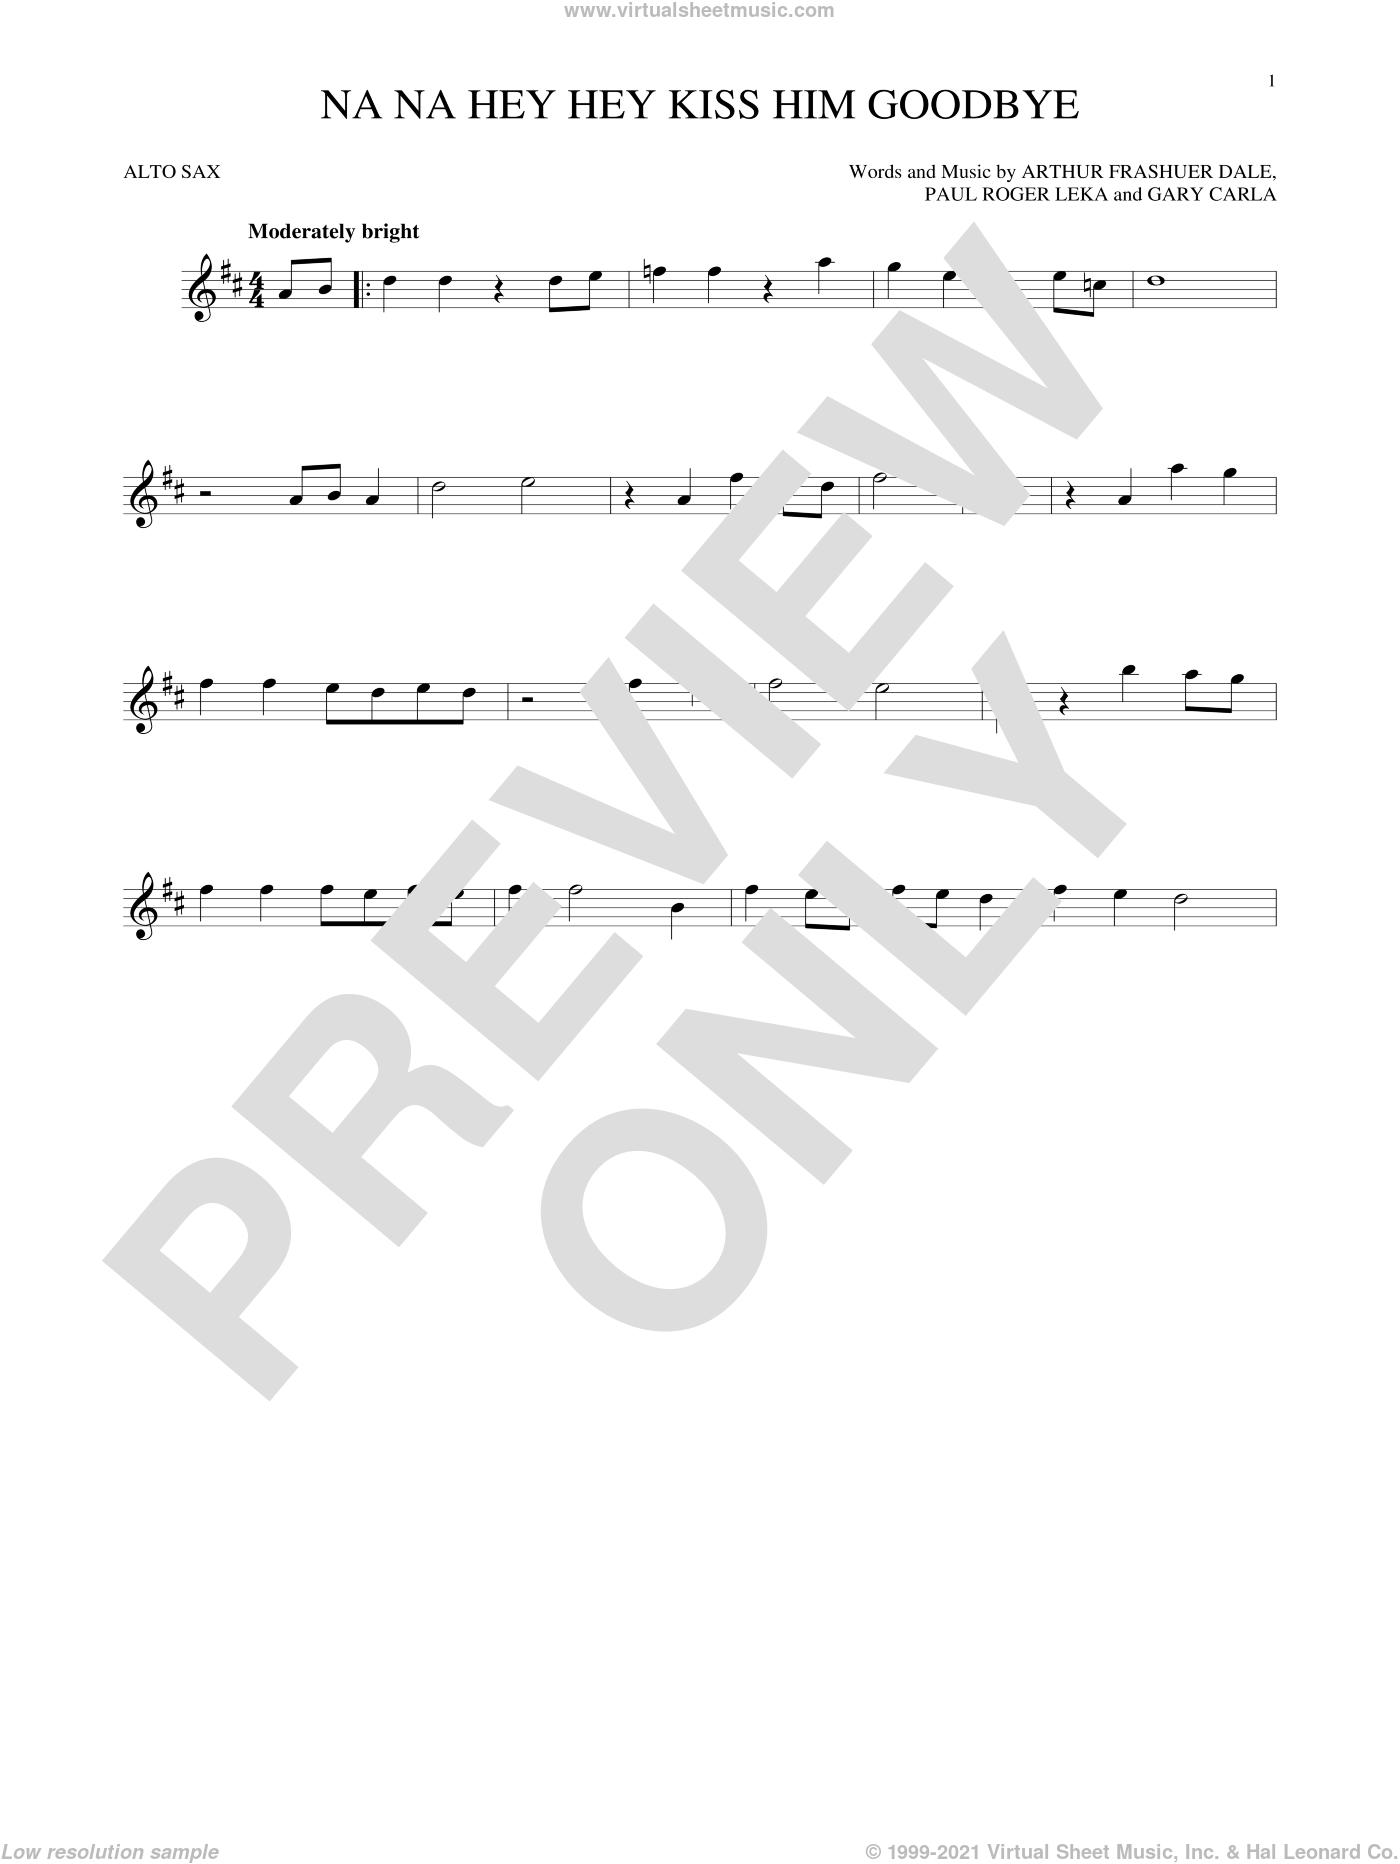 Na Na Hey Hey Kiss Him Goodbye sheet music for alto saxophone solo by Steam, Dale Frashuer, Gary De Carlo and Paul Leka, intermediate skill level